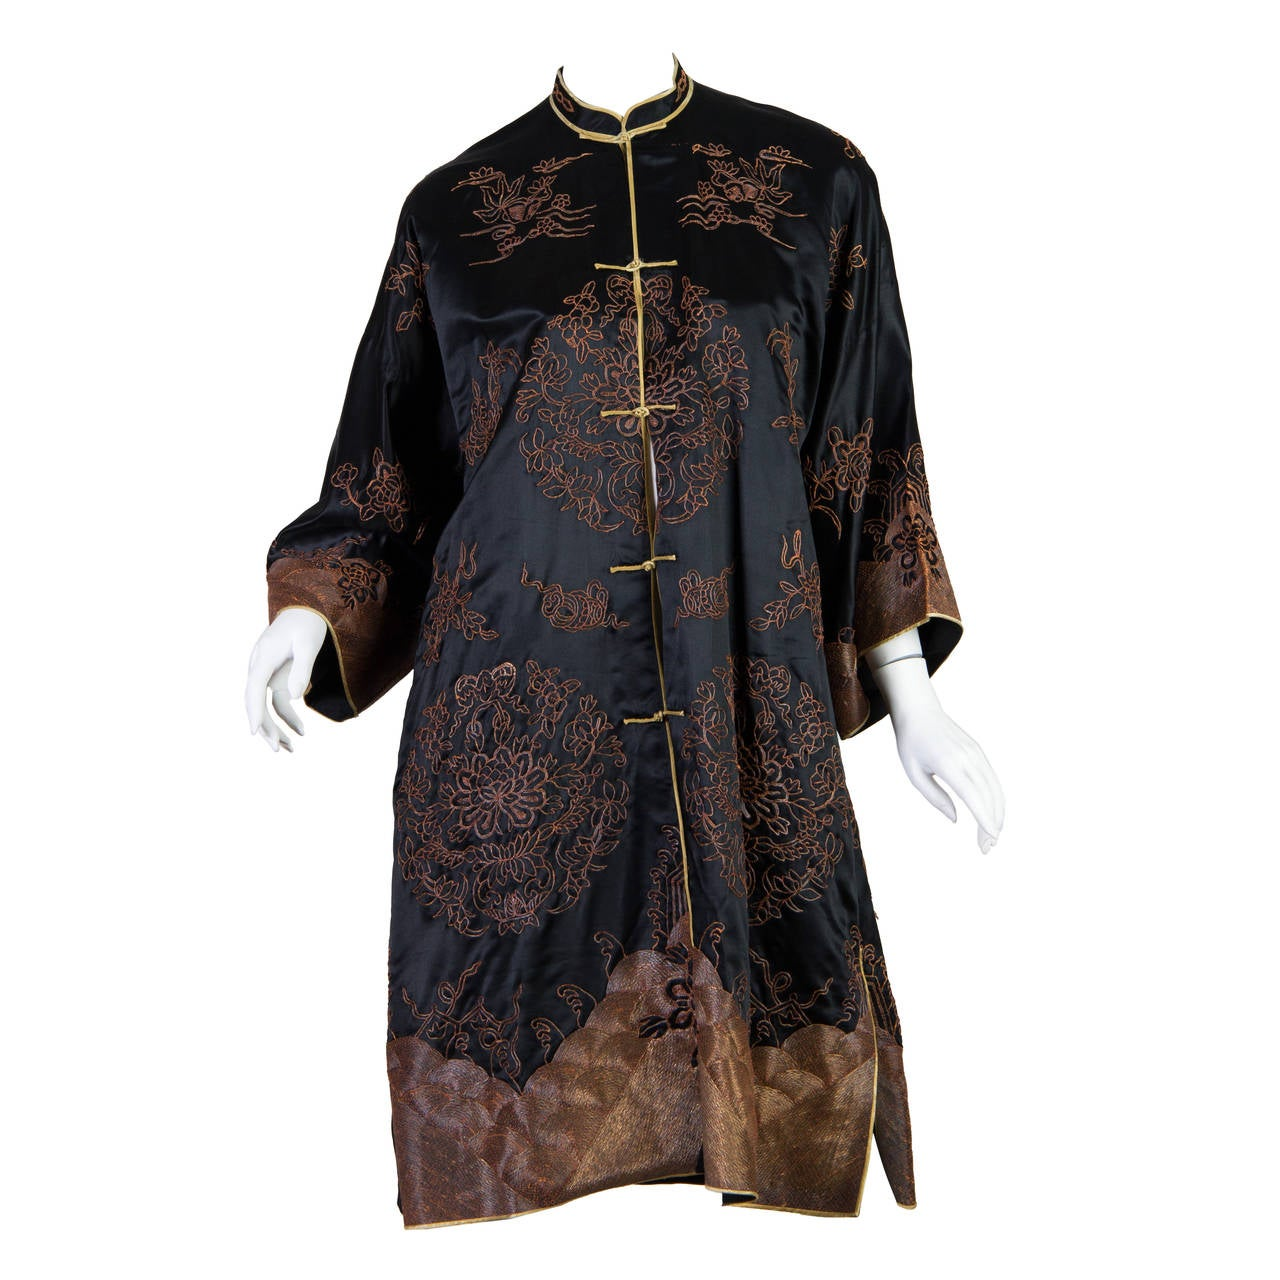 Early Chinese Embroidered Jacket Kimono style 1